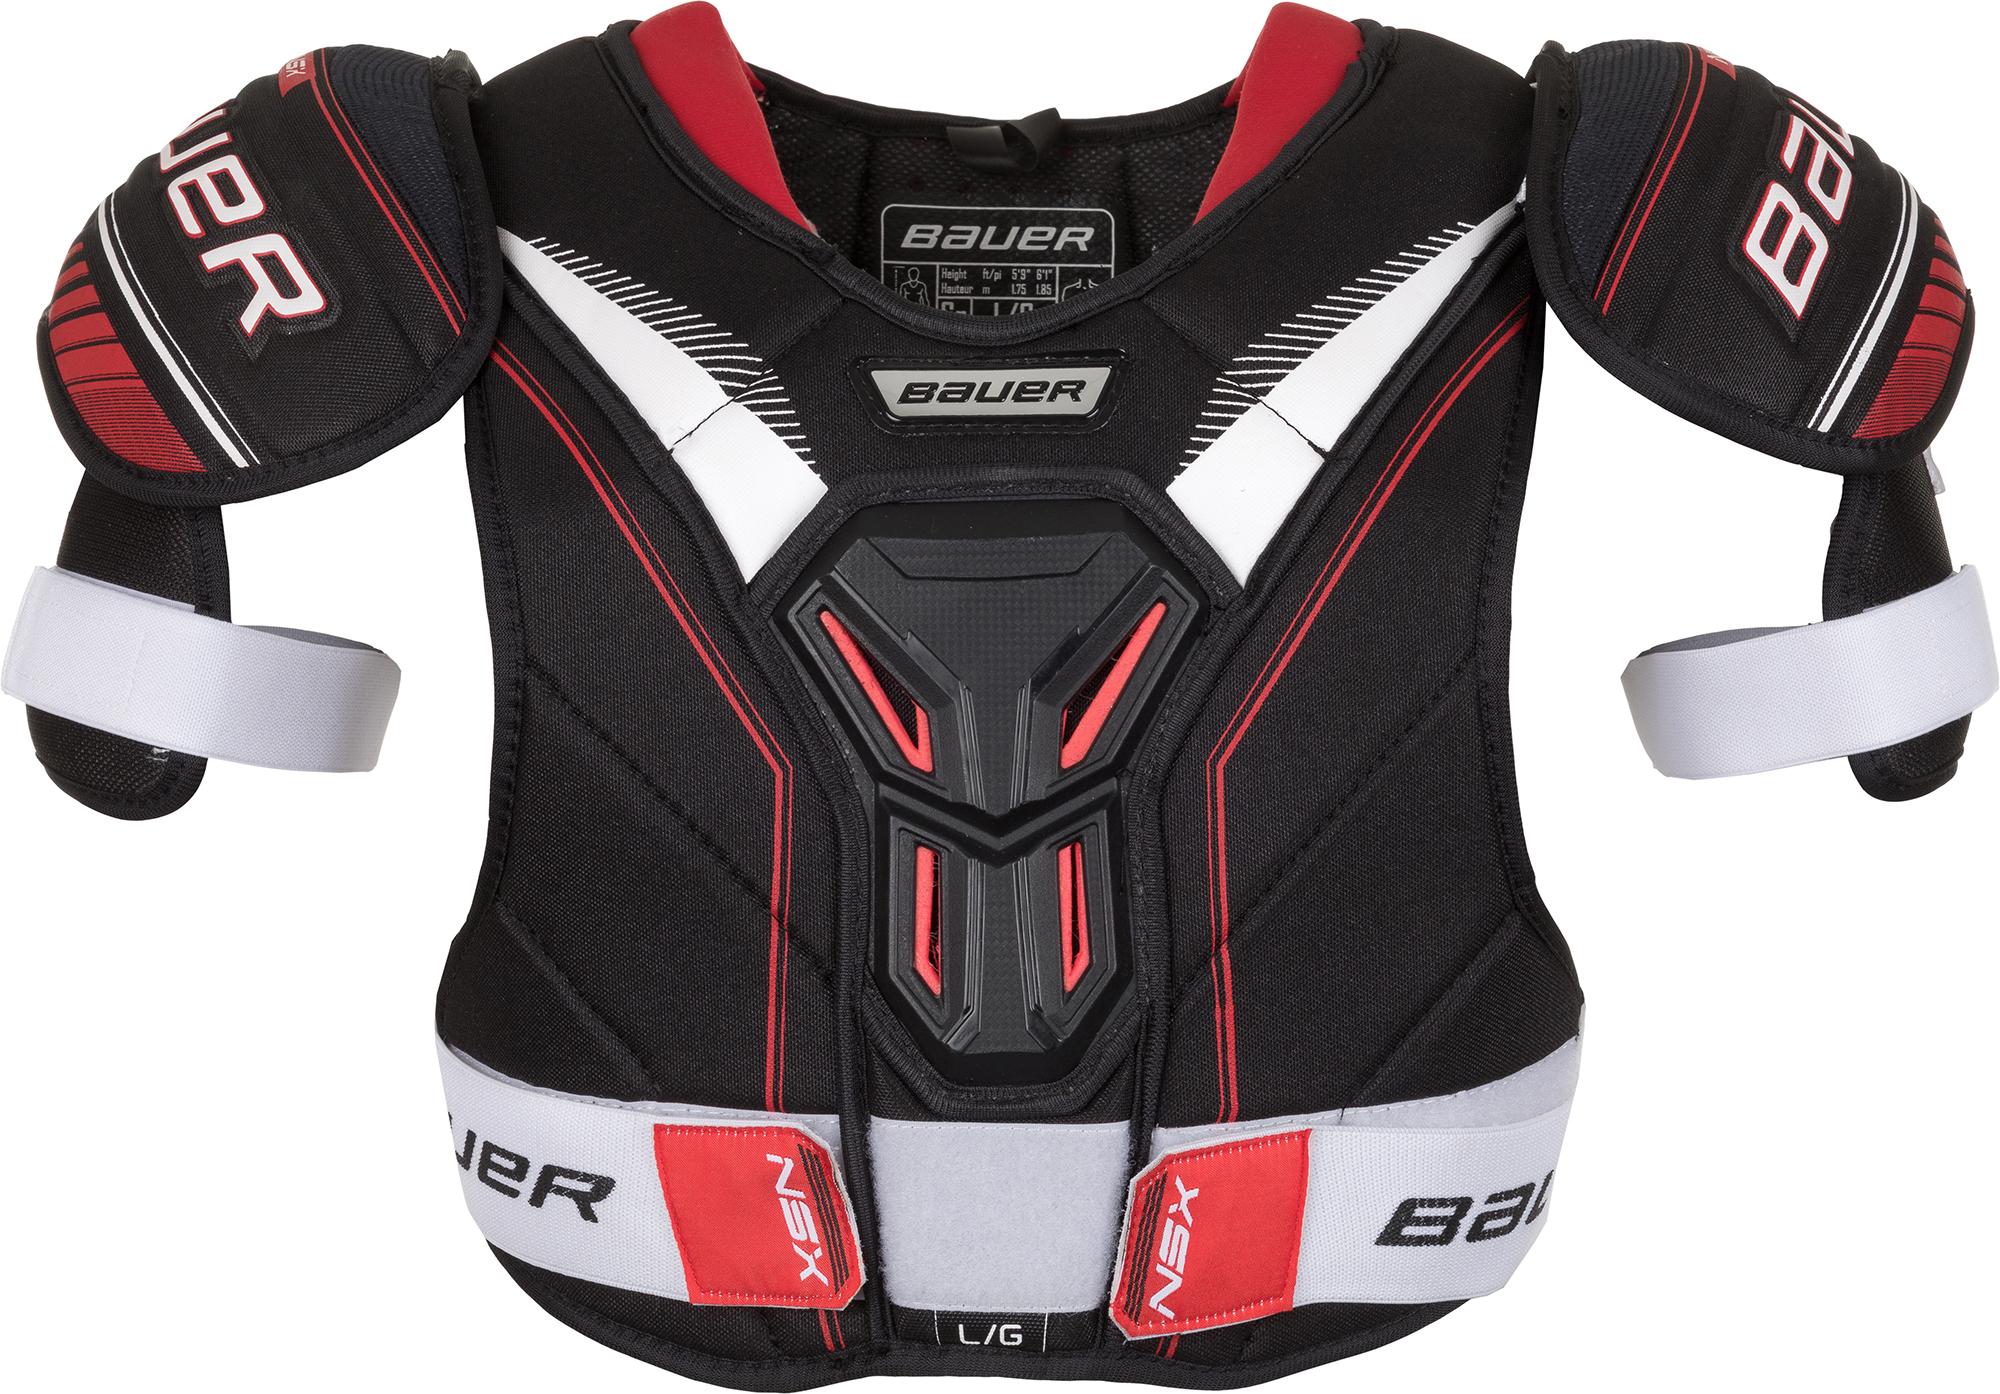 Bauer Защита торса хоккейная Bauer NSX bauer клюшка хоккейная bauer nexus 2n pro h18 grip sr размер l